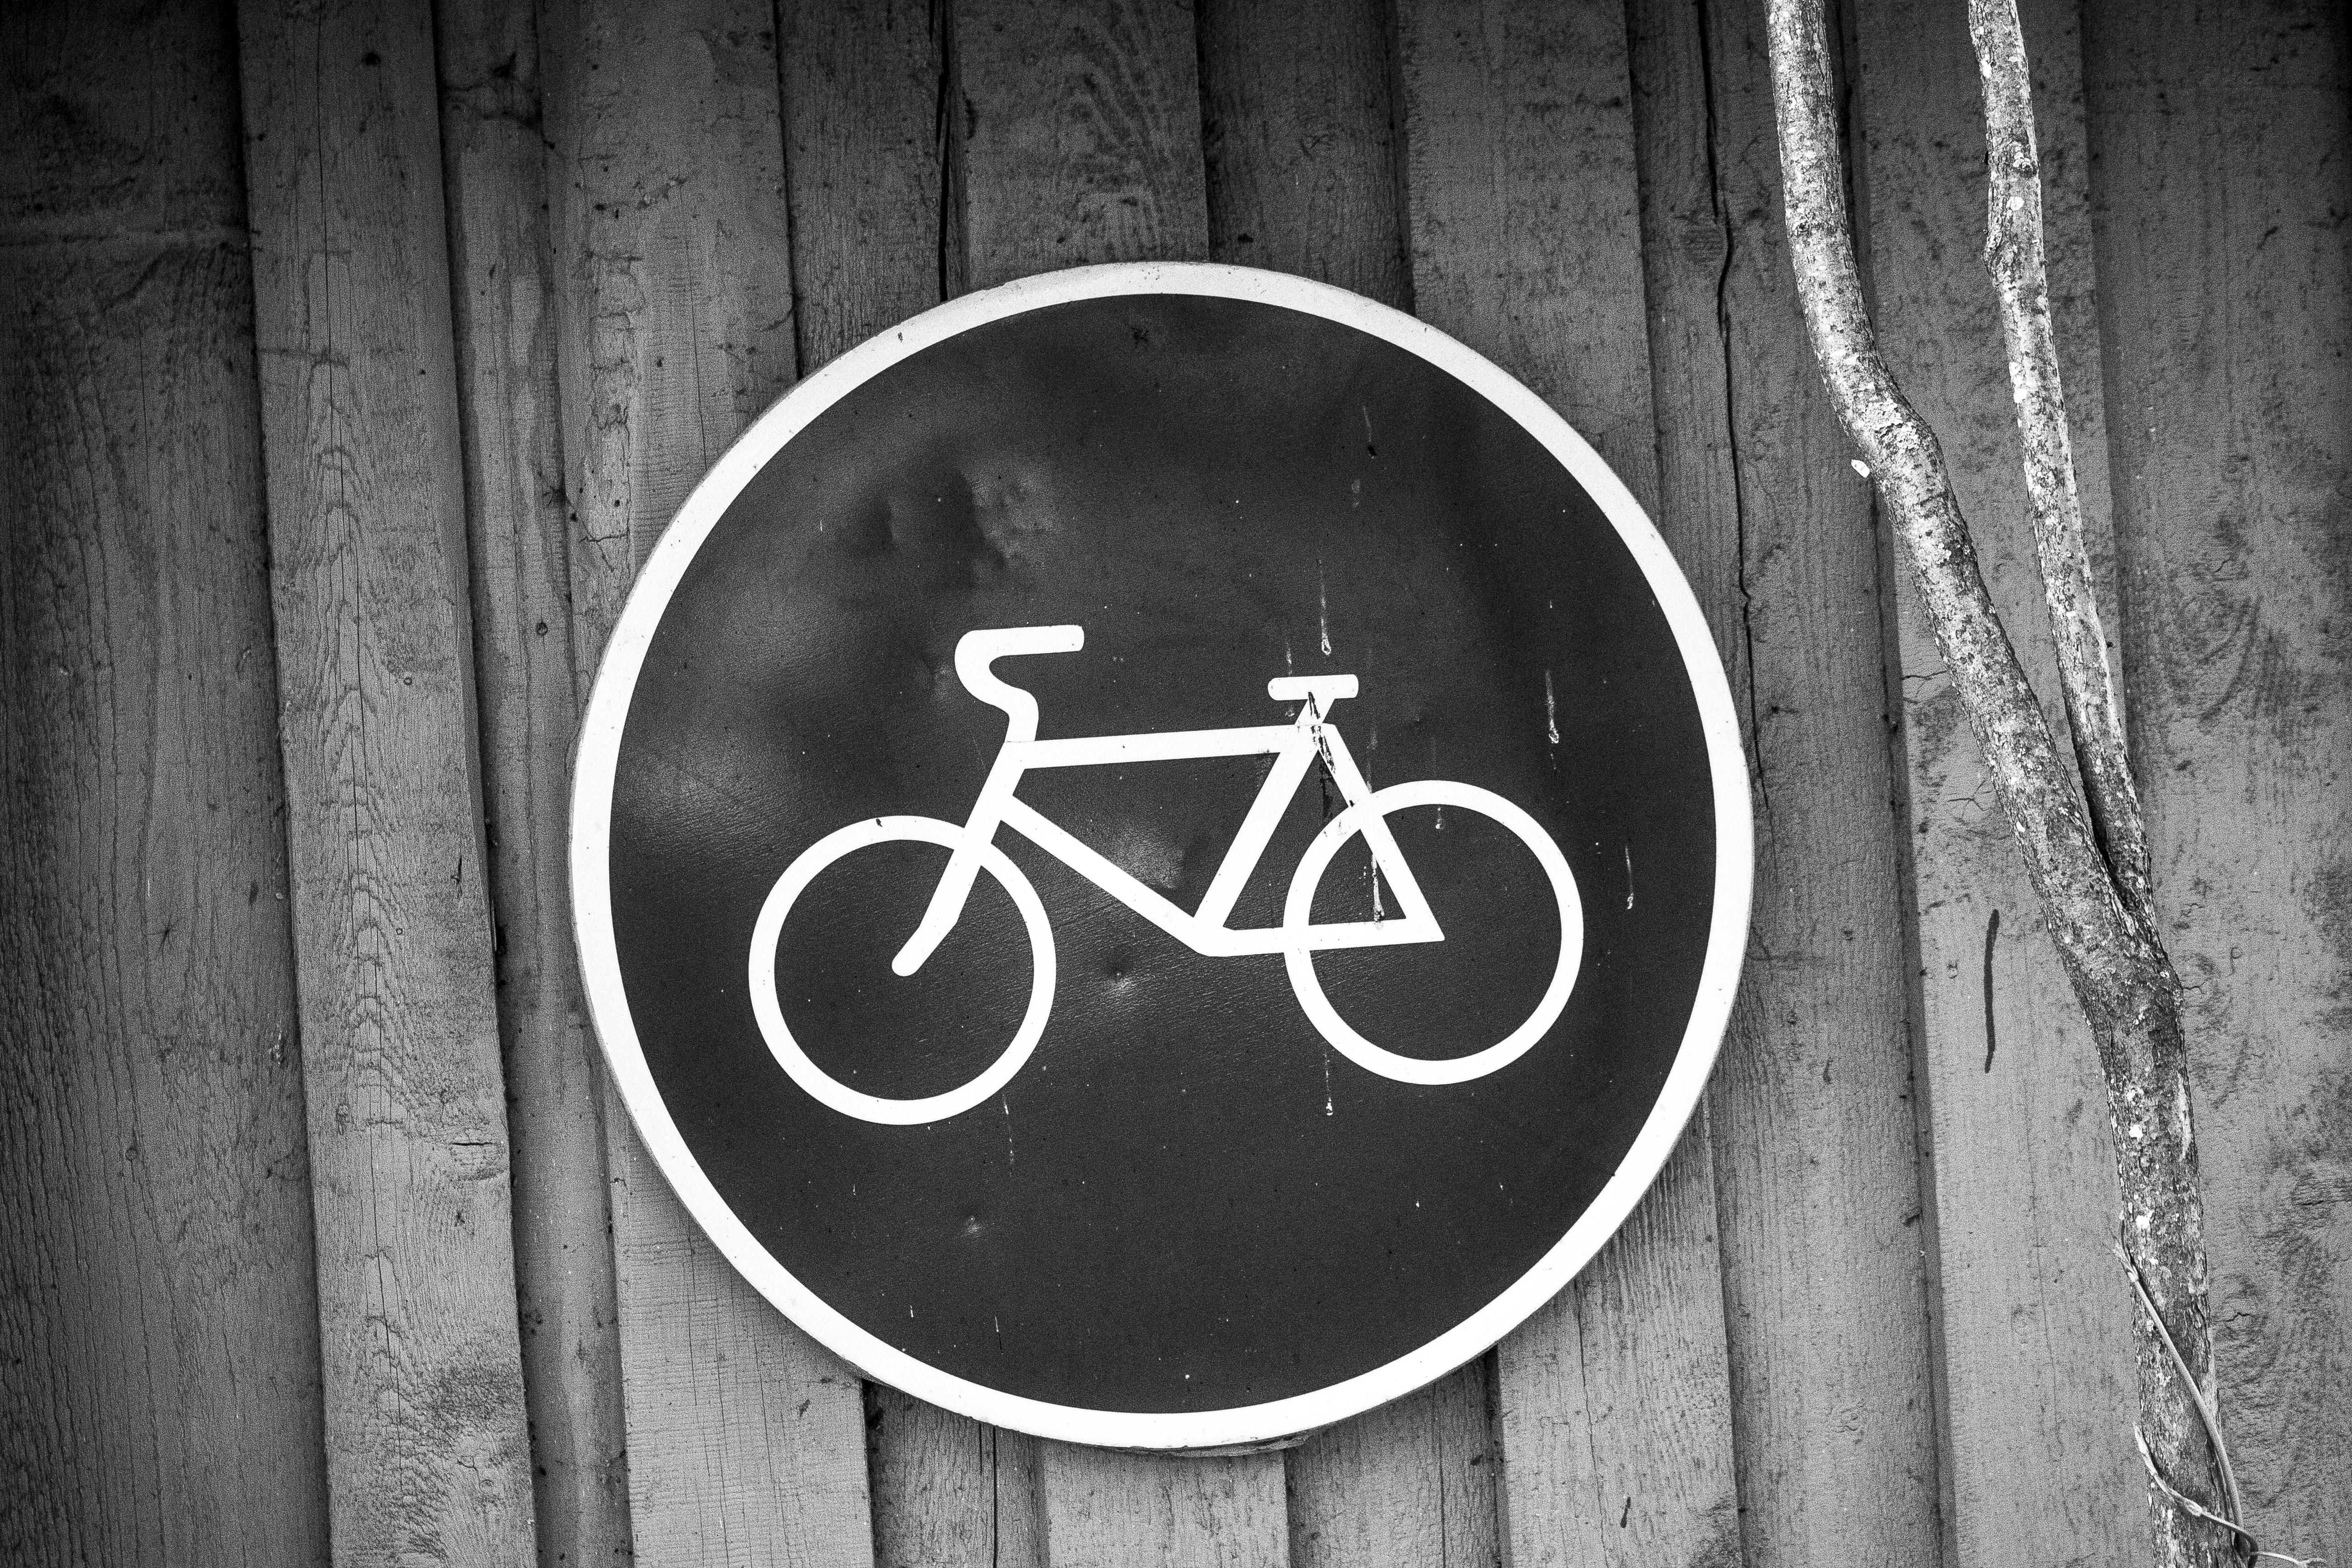 Free Stock Photos Of Bike Pexels